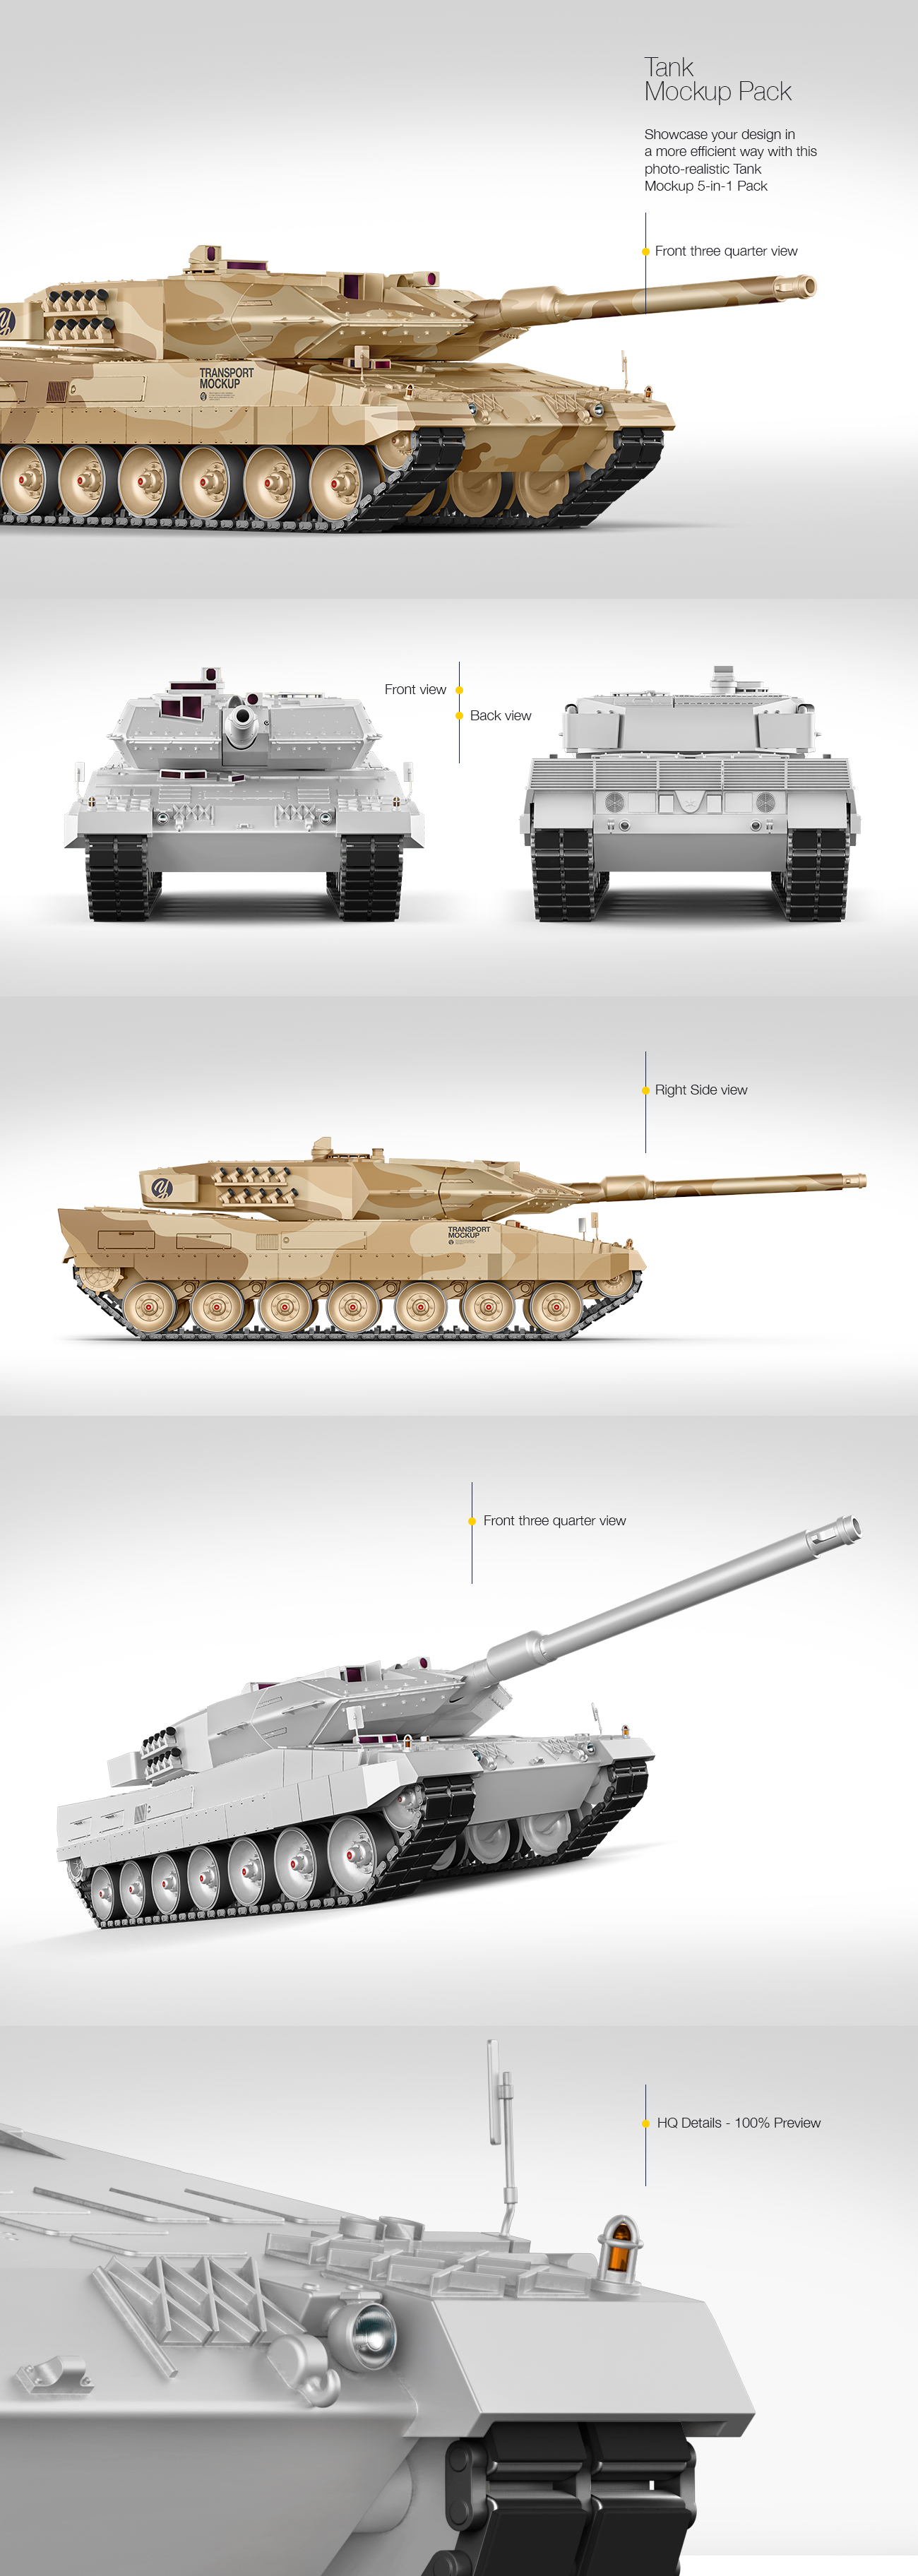 Tank Mockup Pack